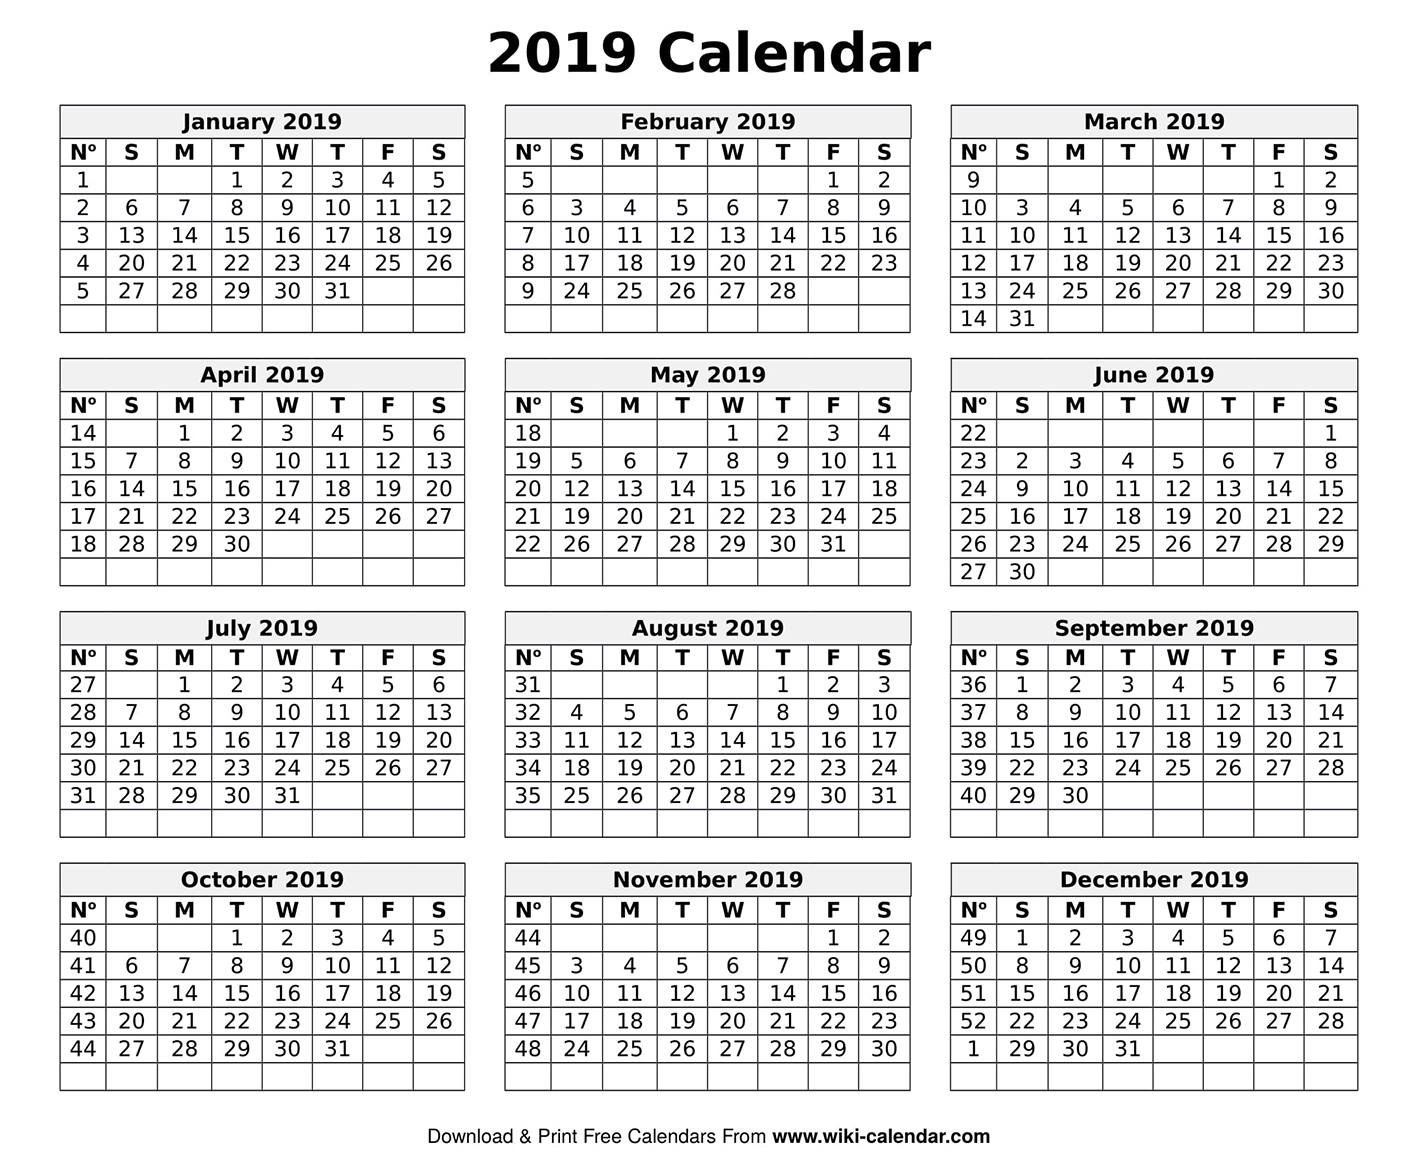 Printable Blank 2019 Calendar Templates regarding Frame Birthday Calendar Templates Free